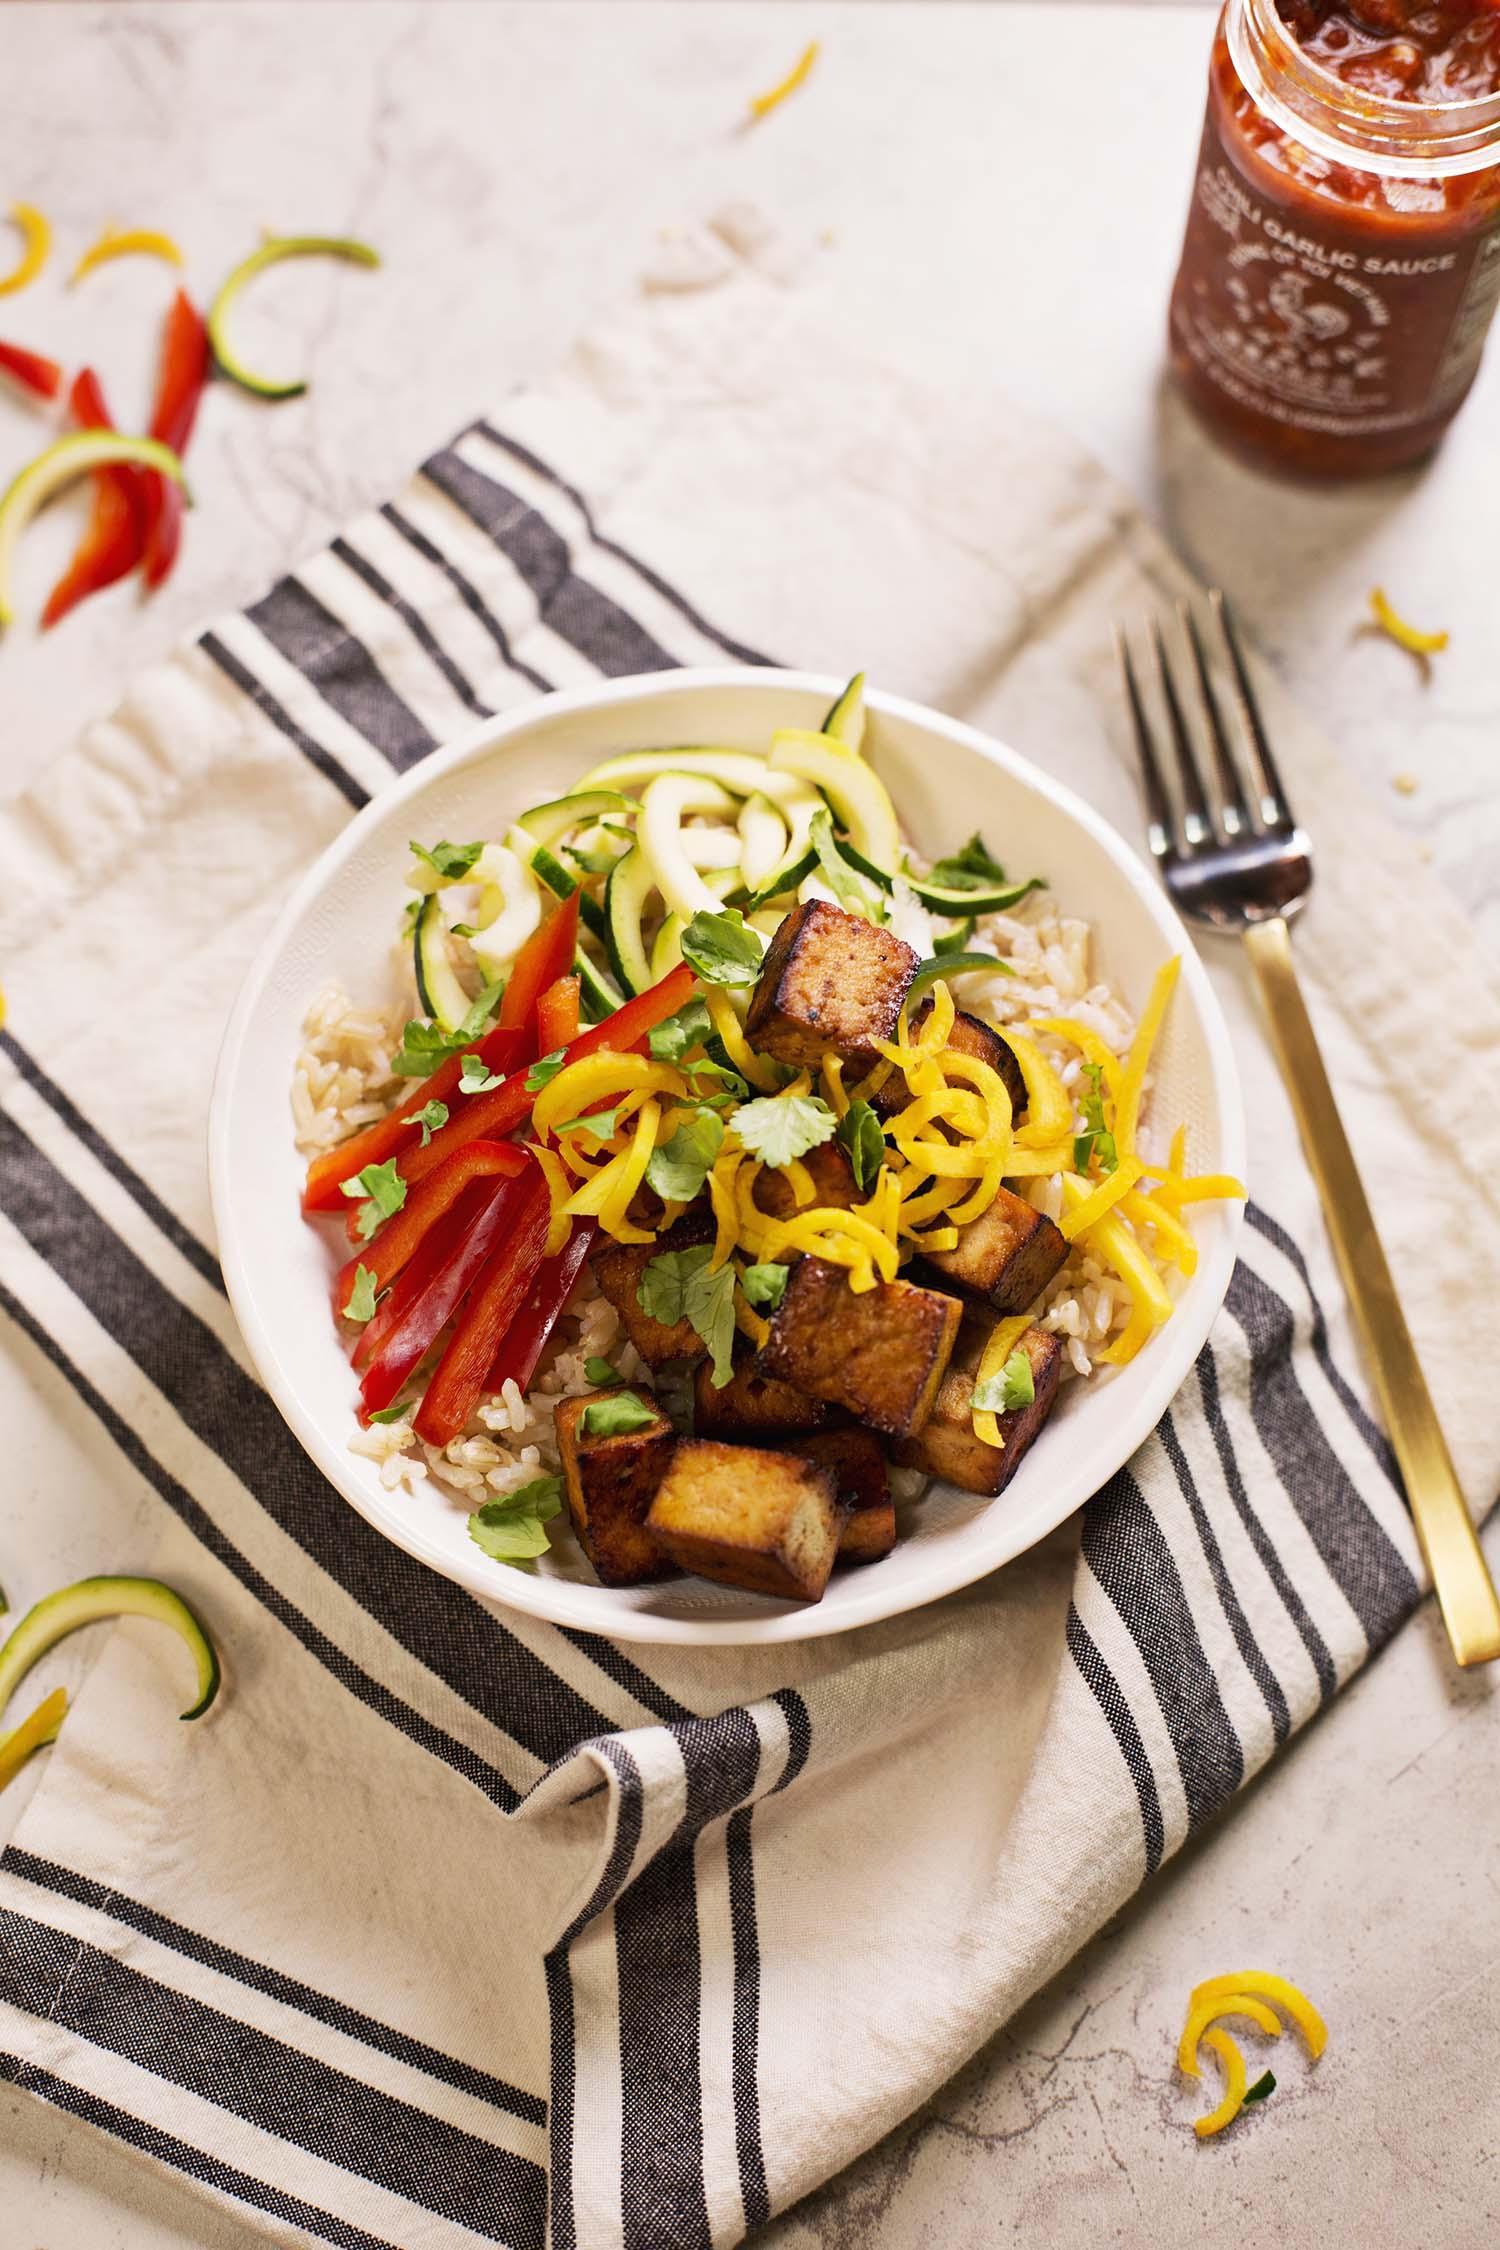 Spicy Brown Rice Bowls (via abeautifulmess.com)